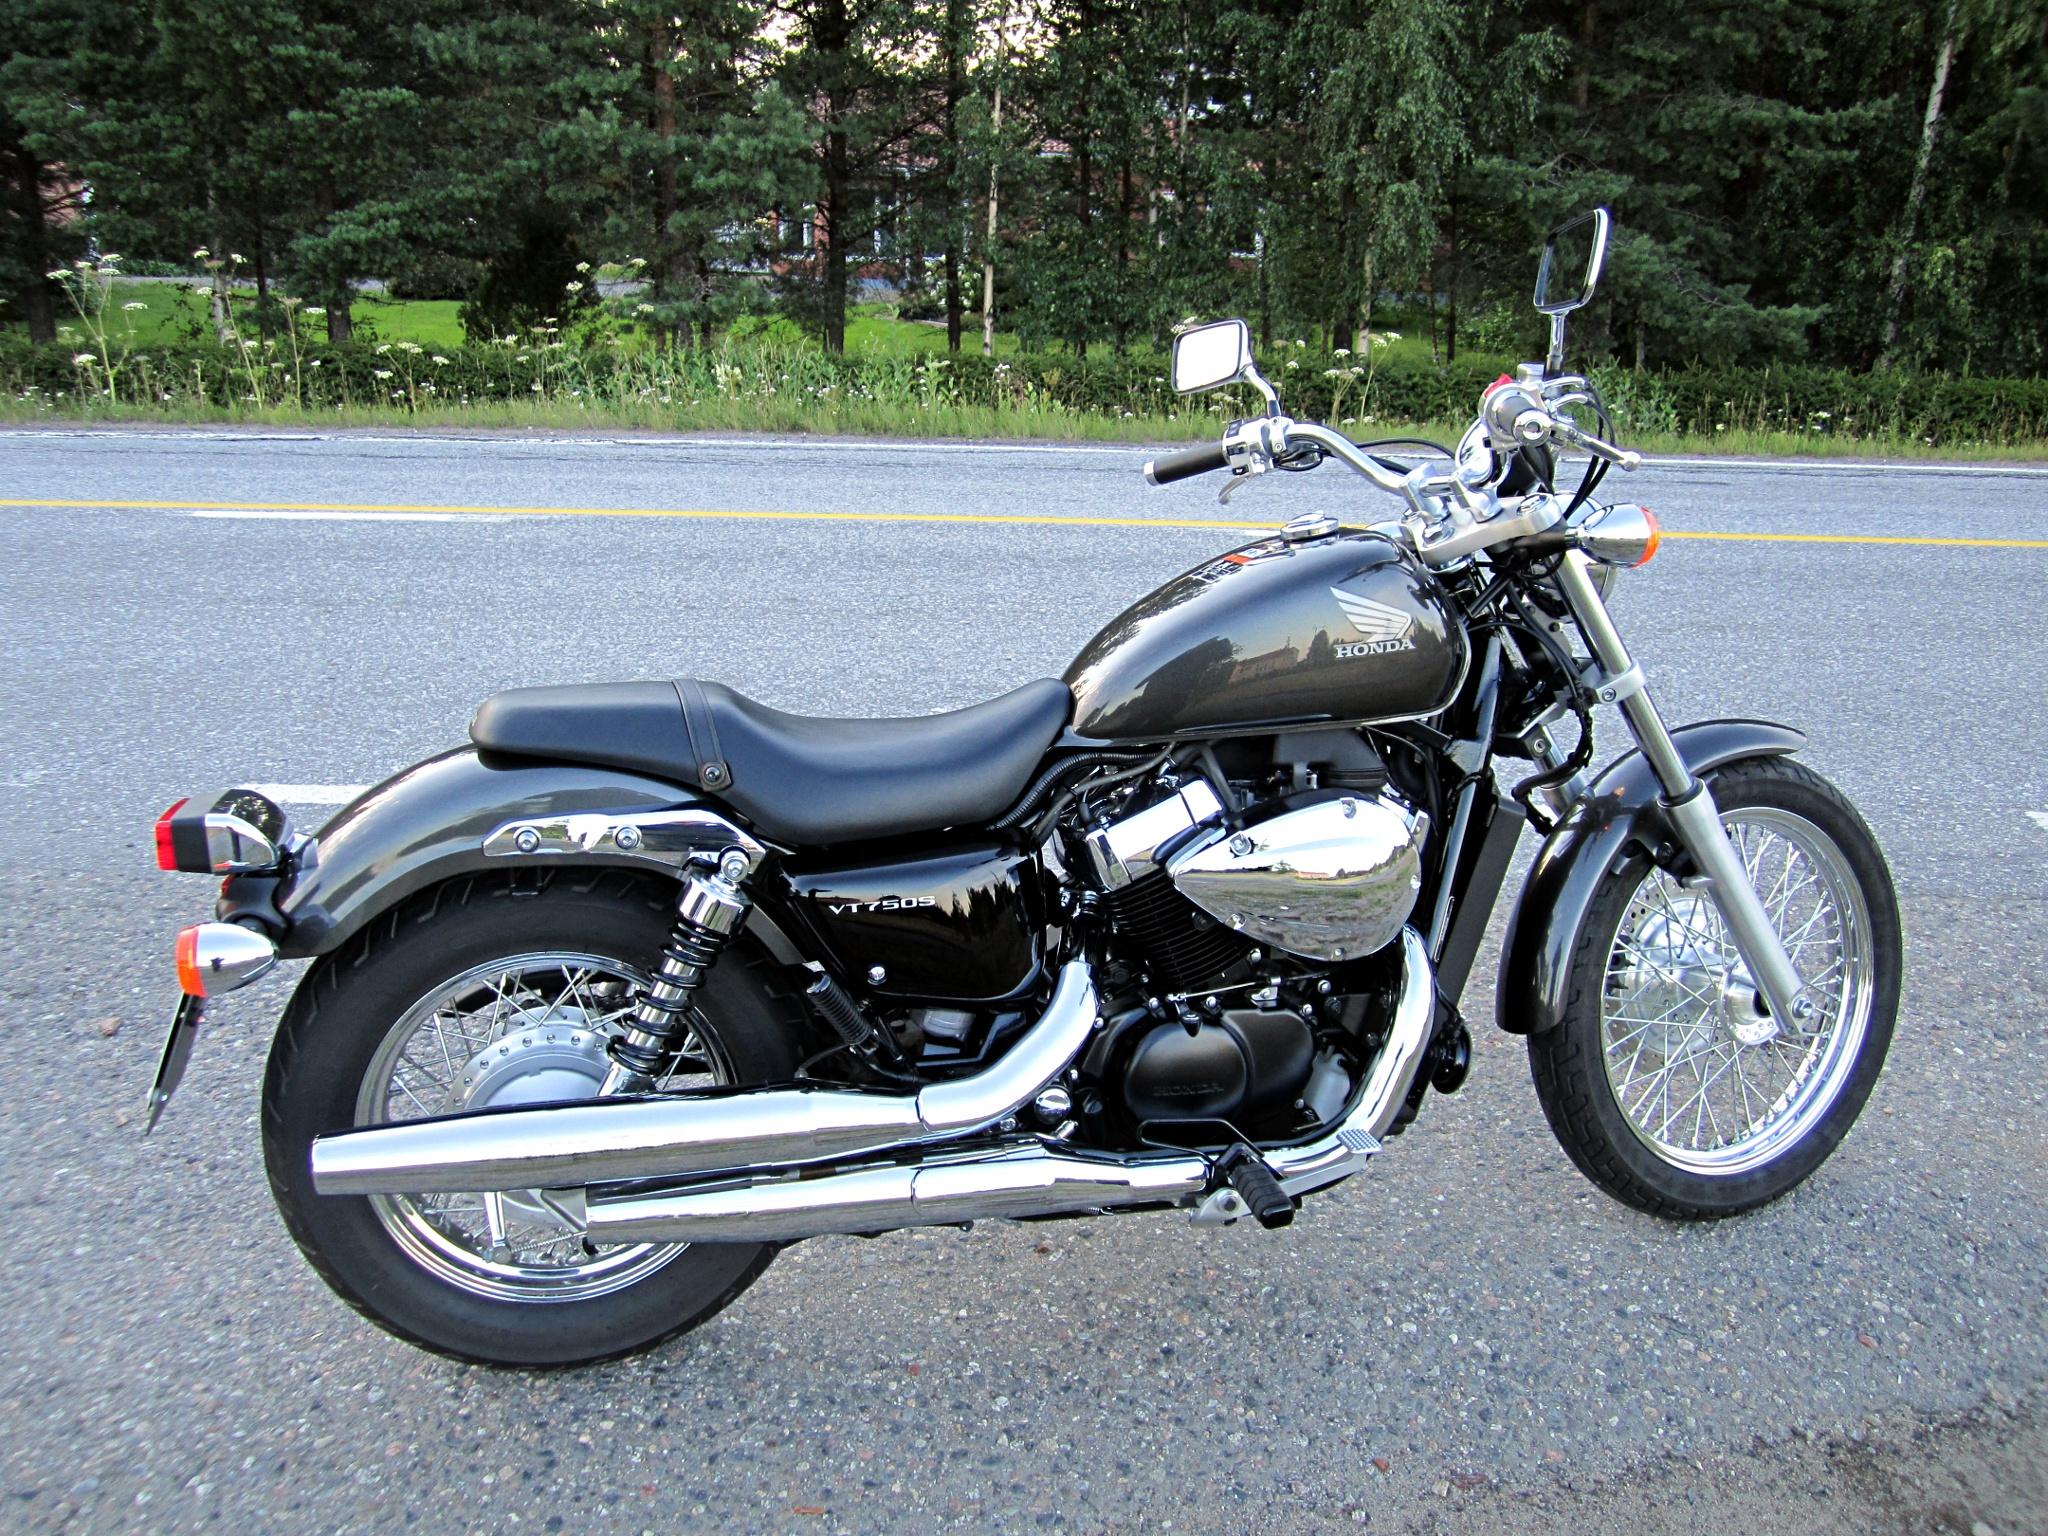 File Honda Vt750s Motorcycle 2011 Jpg Wikimedia Commons